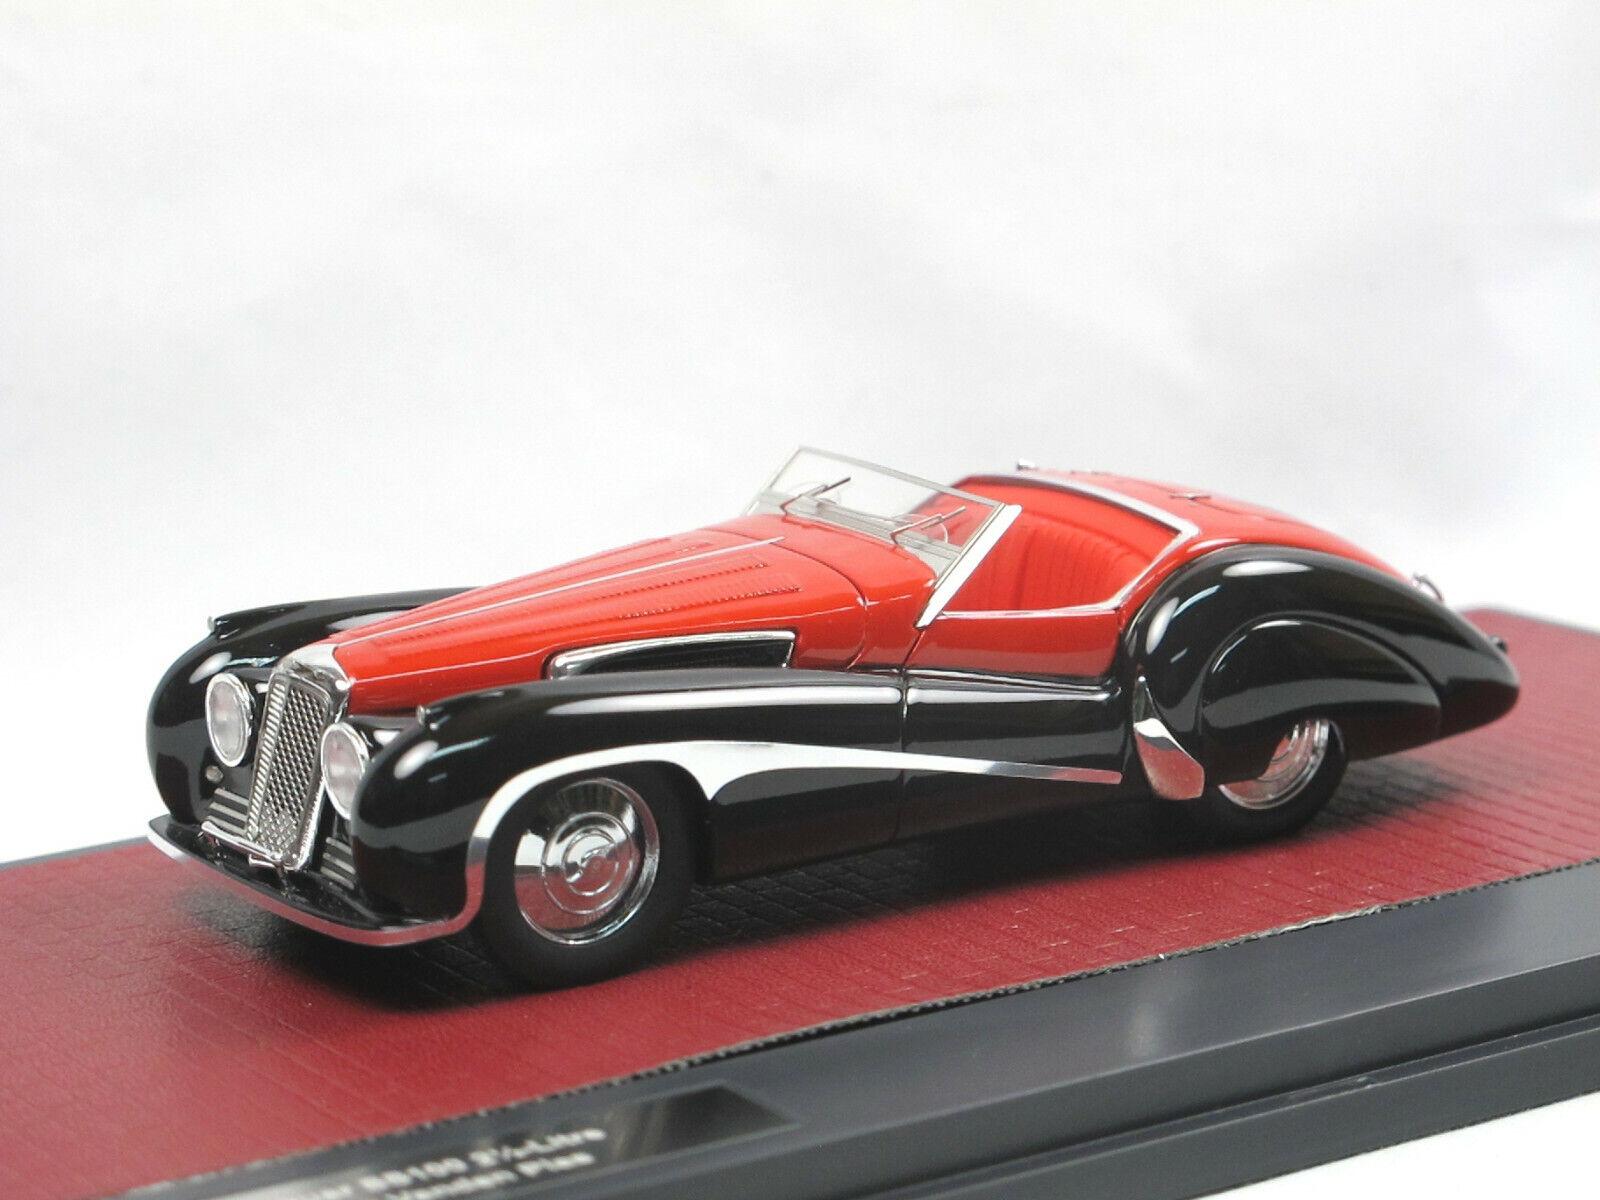 Matrix Scale Models 1939 JAGUAR ss100 2 1 2 - litre-Roadster Vanden Plas rosso 1 43